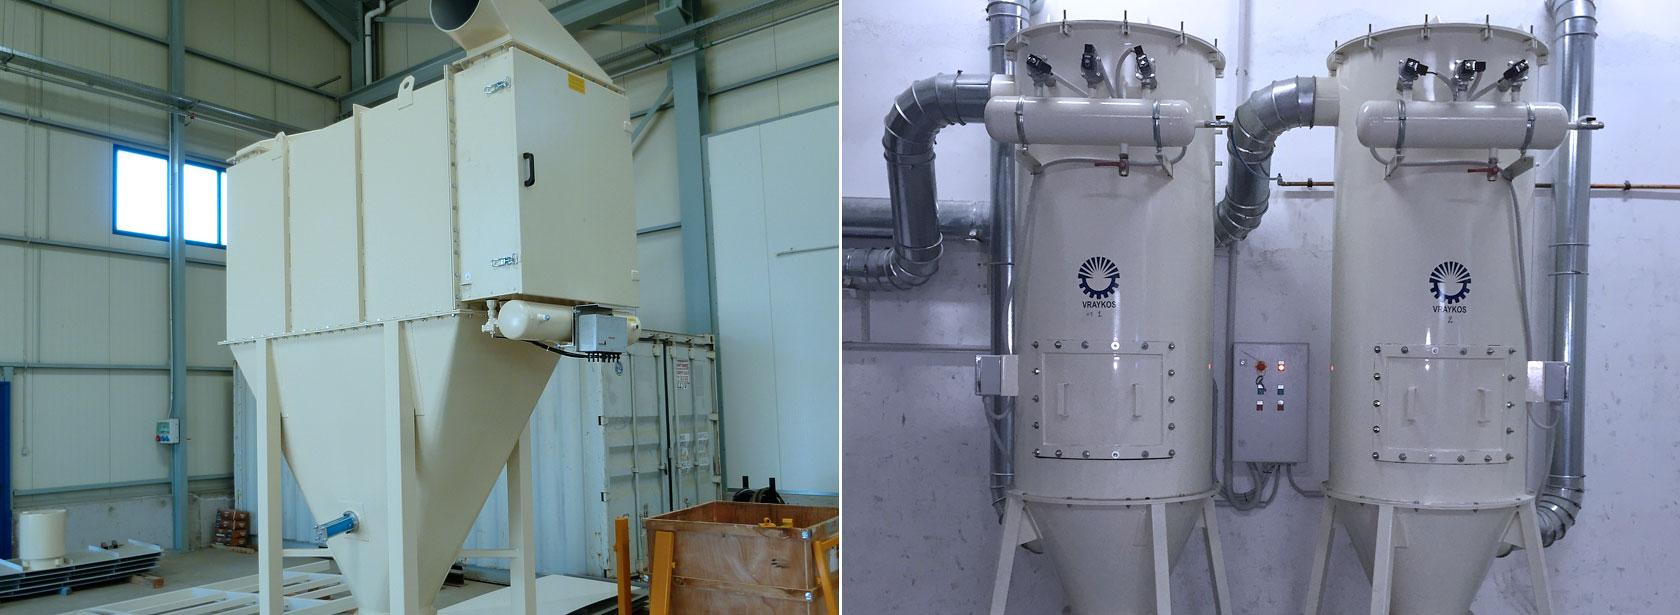 Aspiration – Dust Filtering System